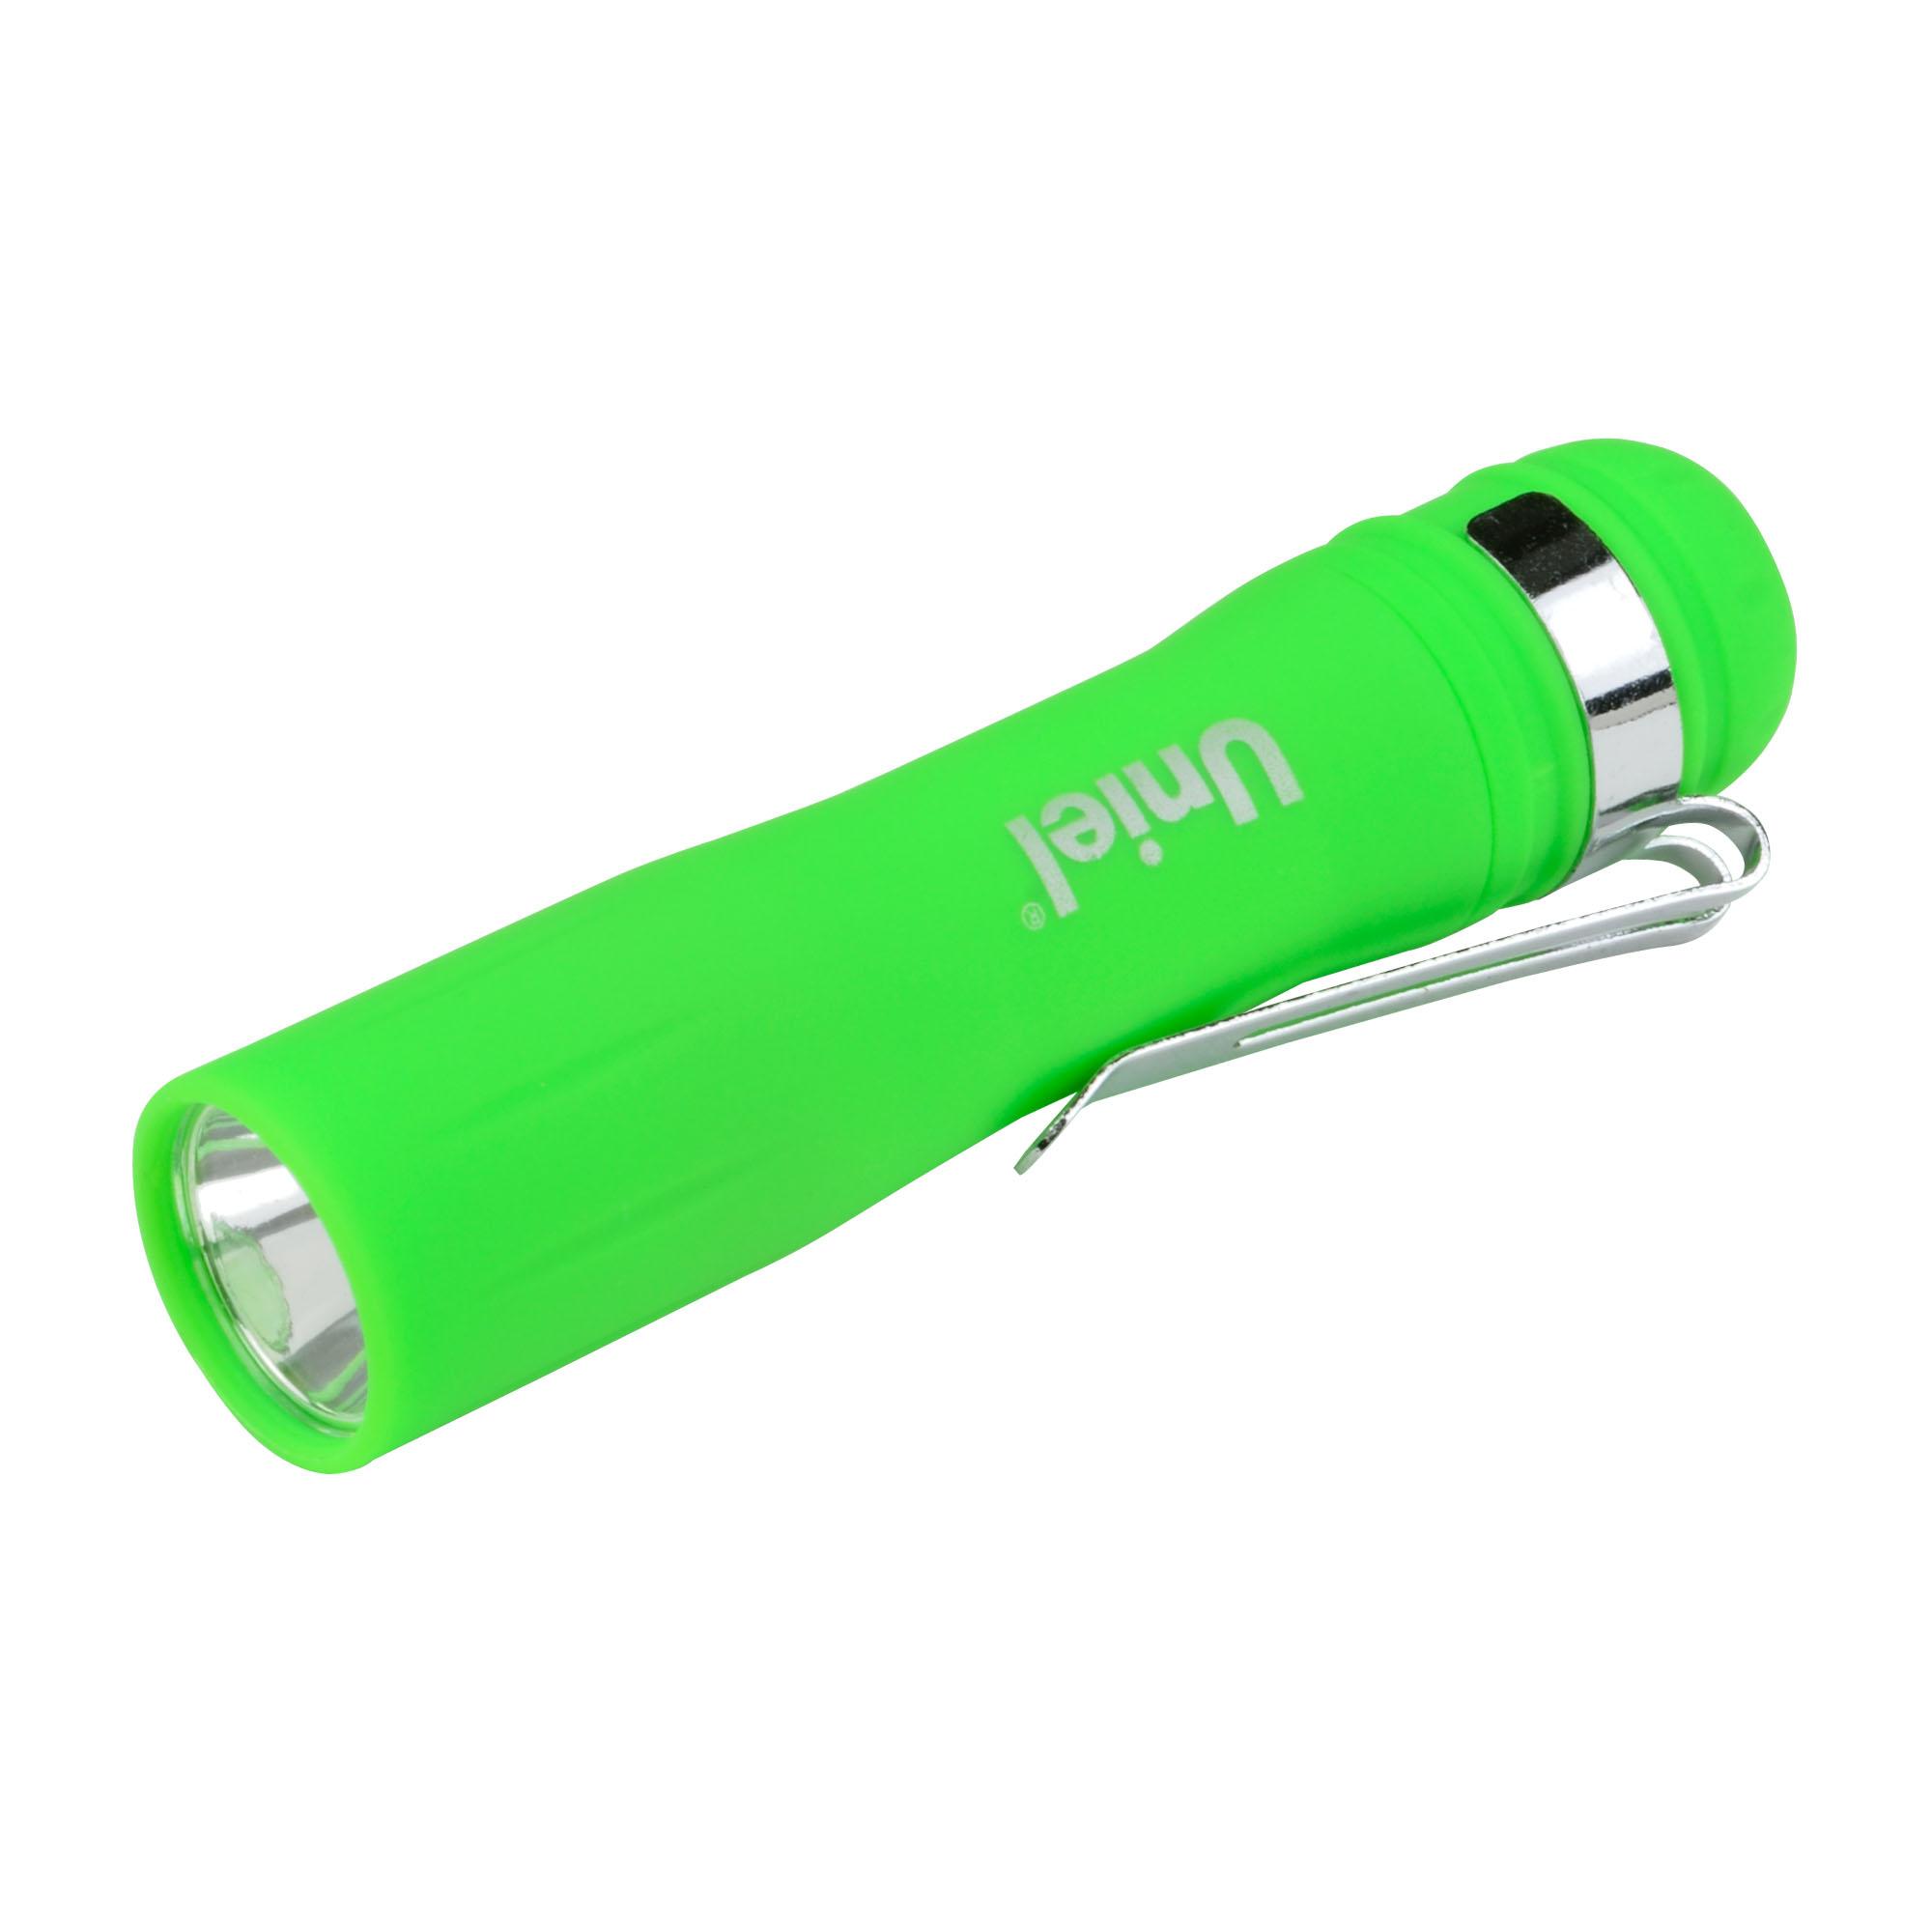 Фонарь Uniel S-ld045-b green ''simple light-debut'' 100 pcs ld 3361ag 3 digit 0 36 green 7 segment led display common cathode